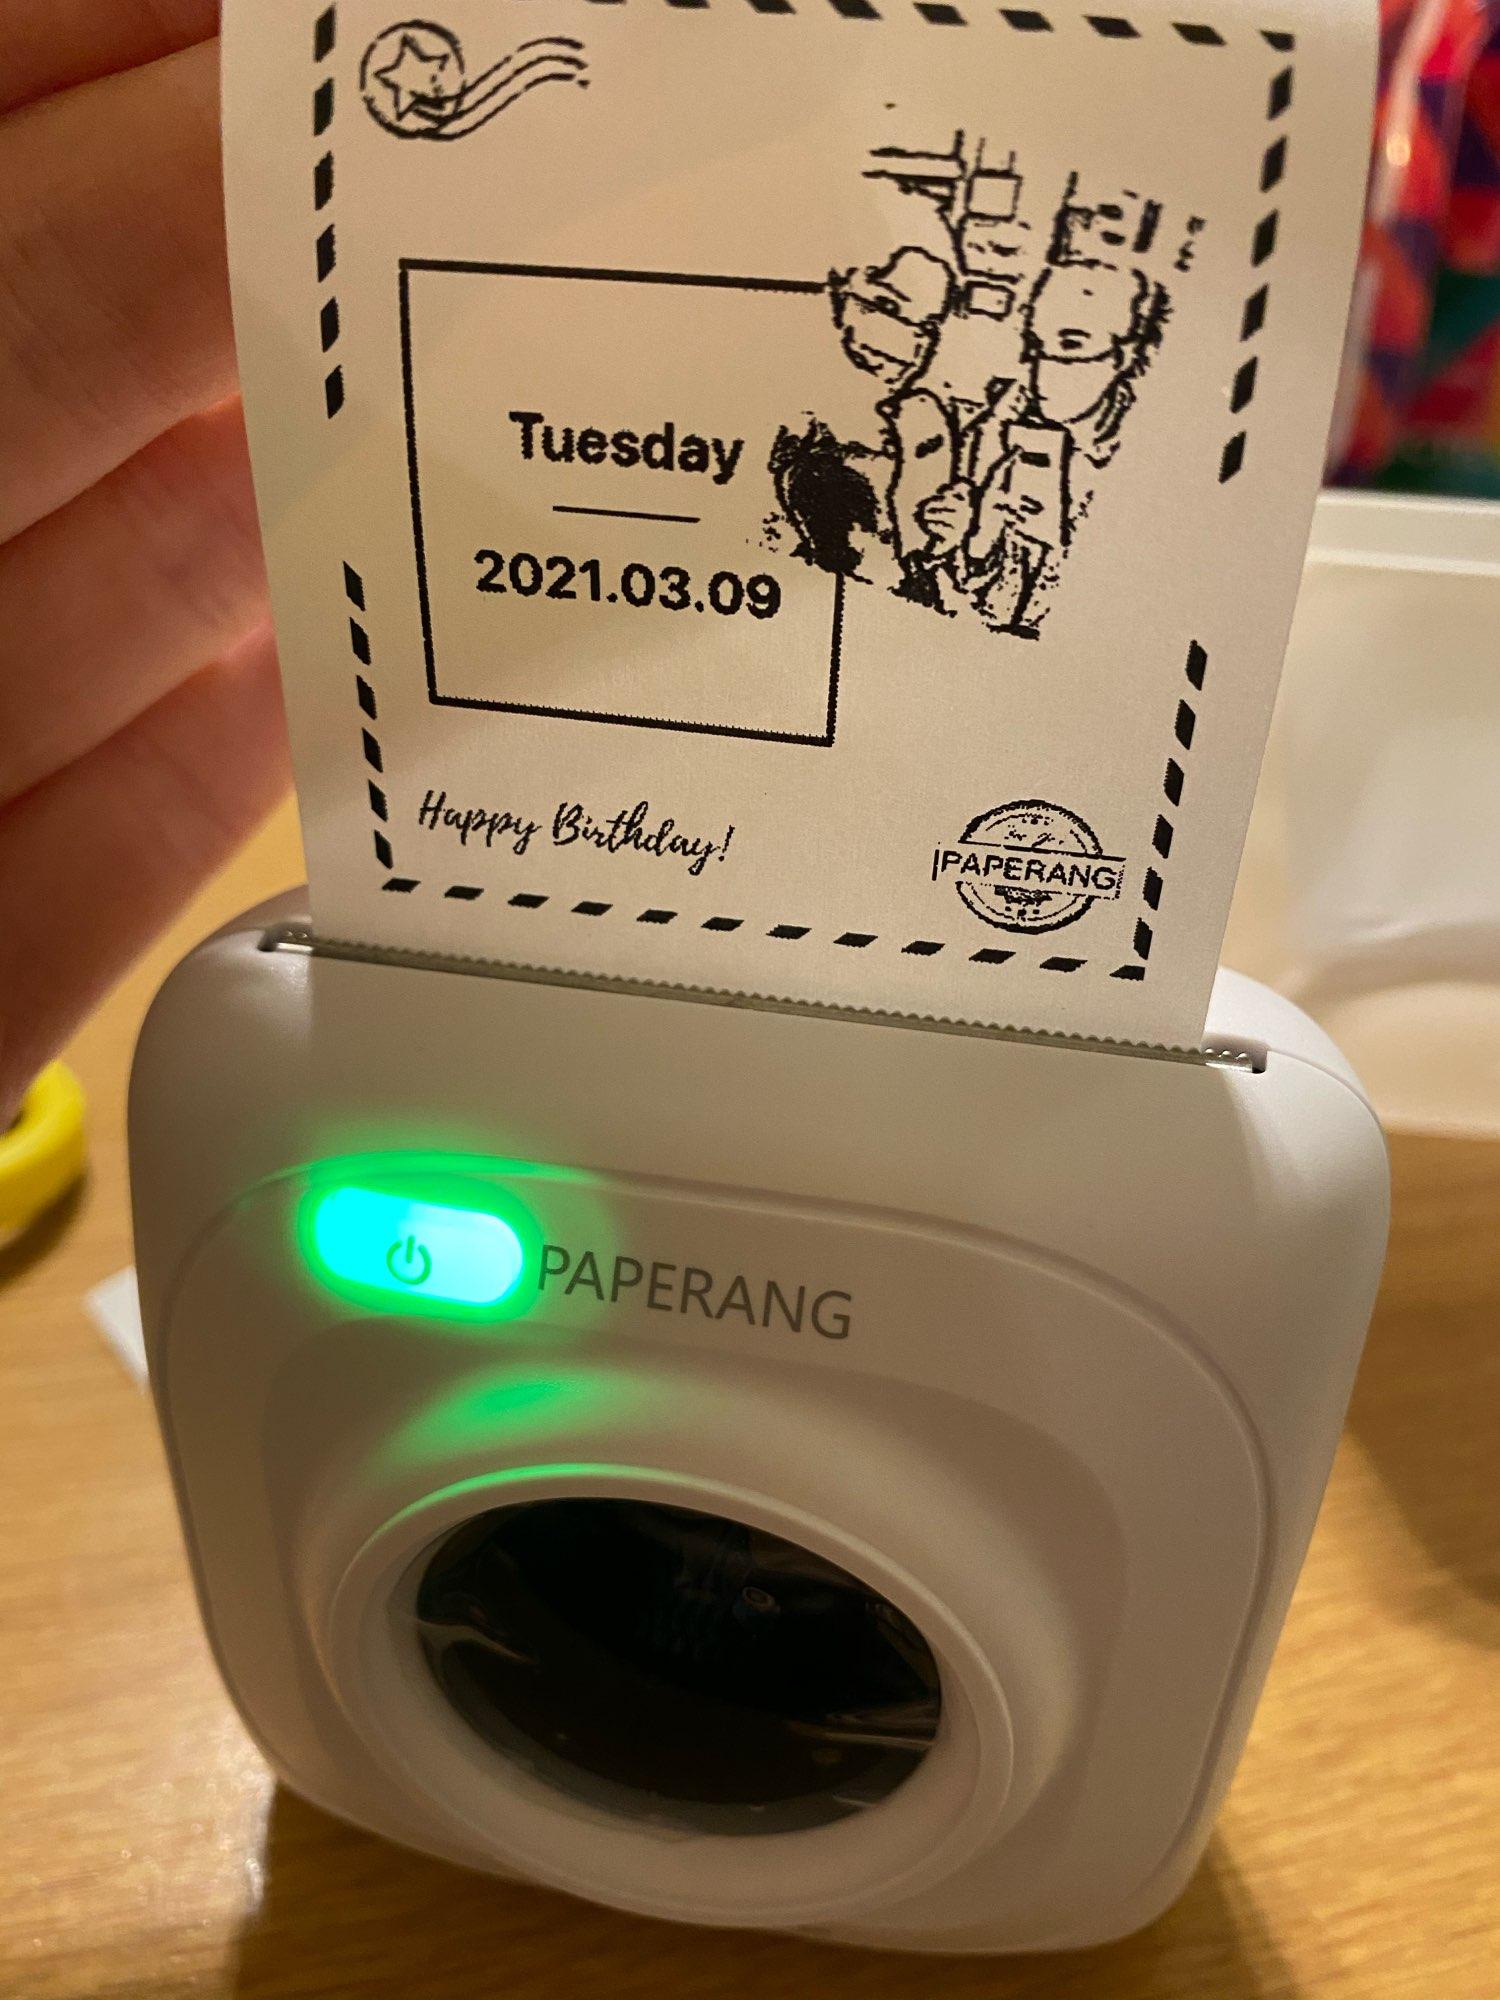 Thermal Printer Mini Mobile Photo Printer photo review